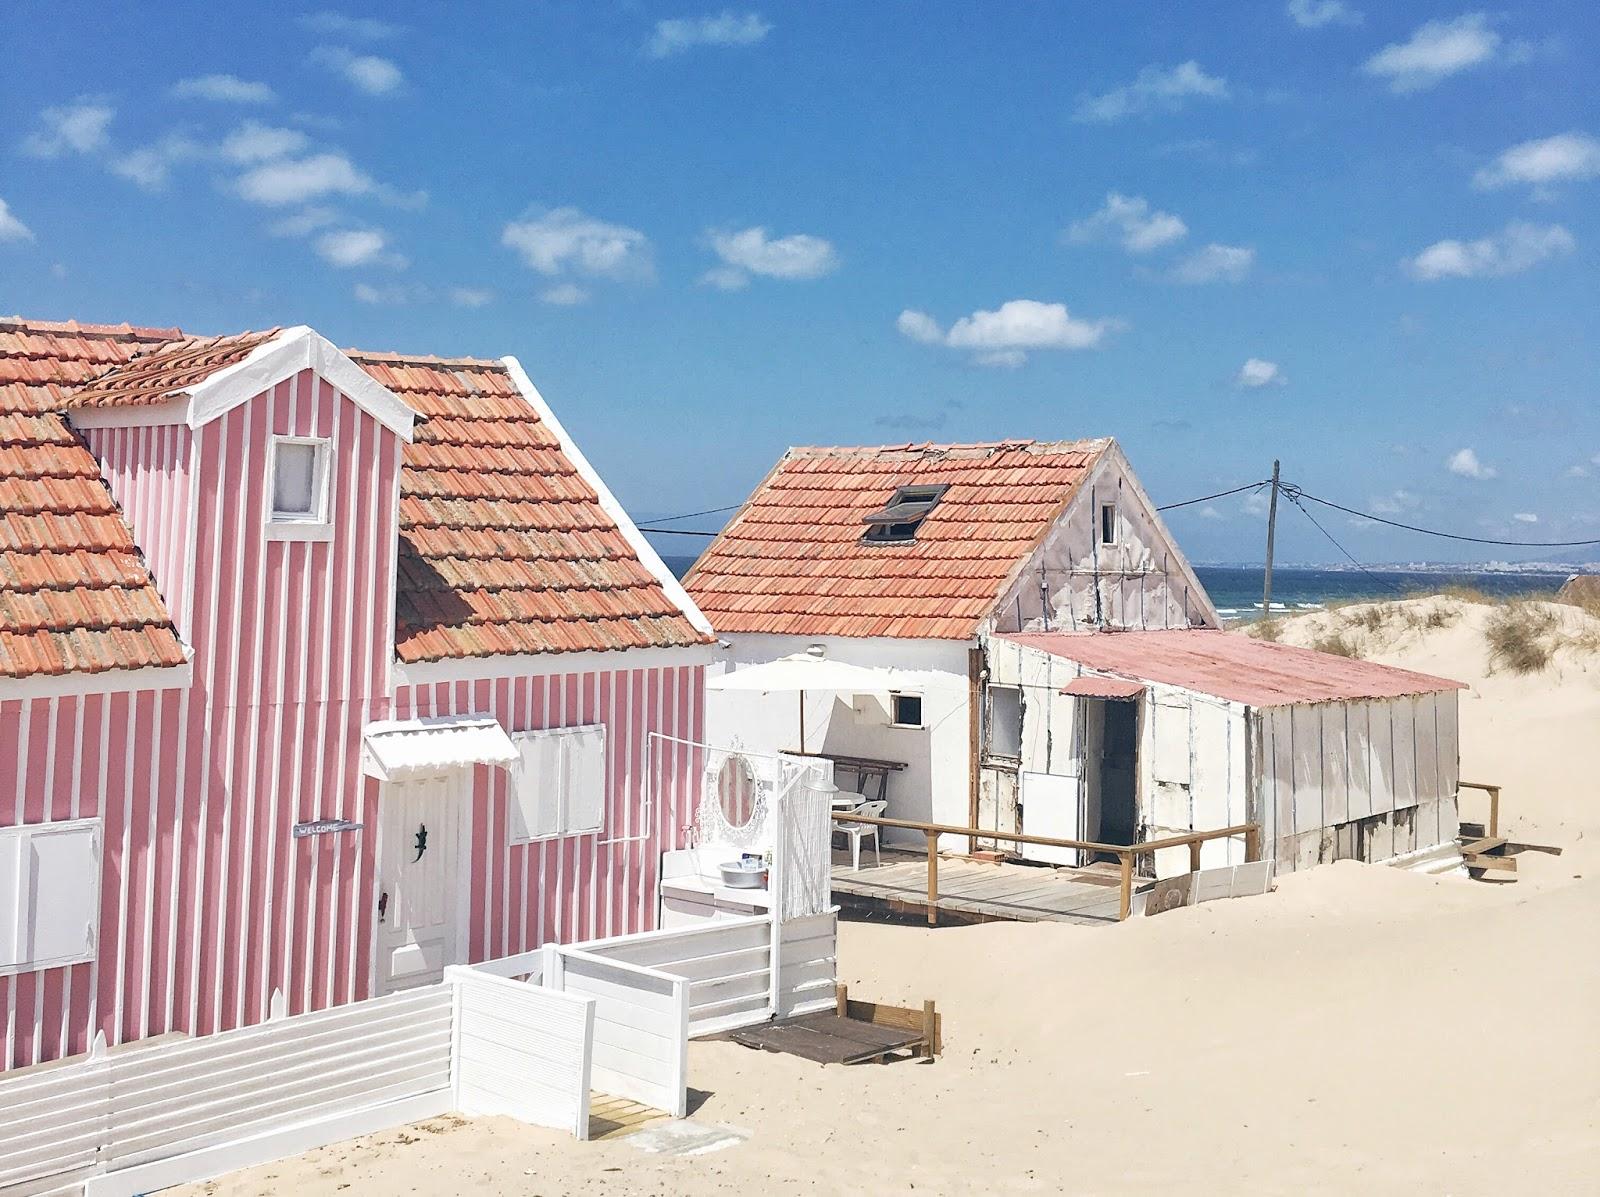 Costa da Caparica, Portugal, Lisbon, Ejnets